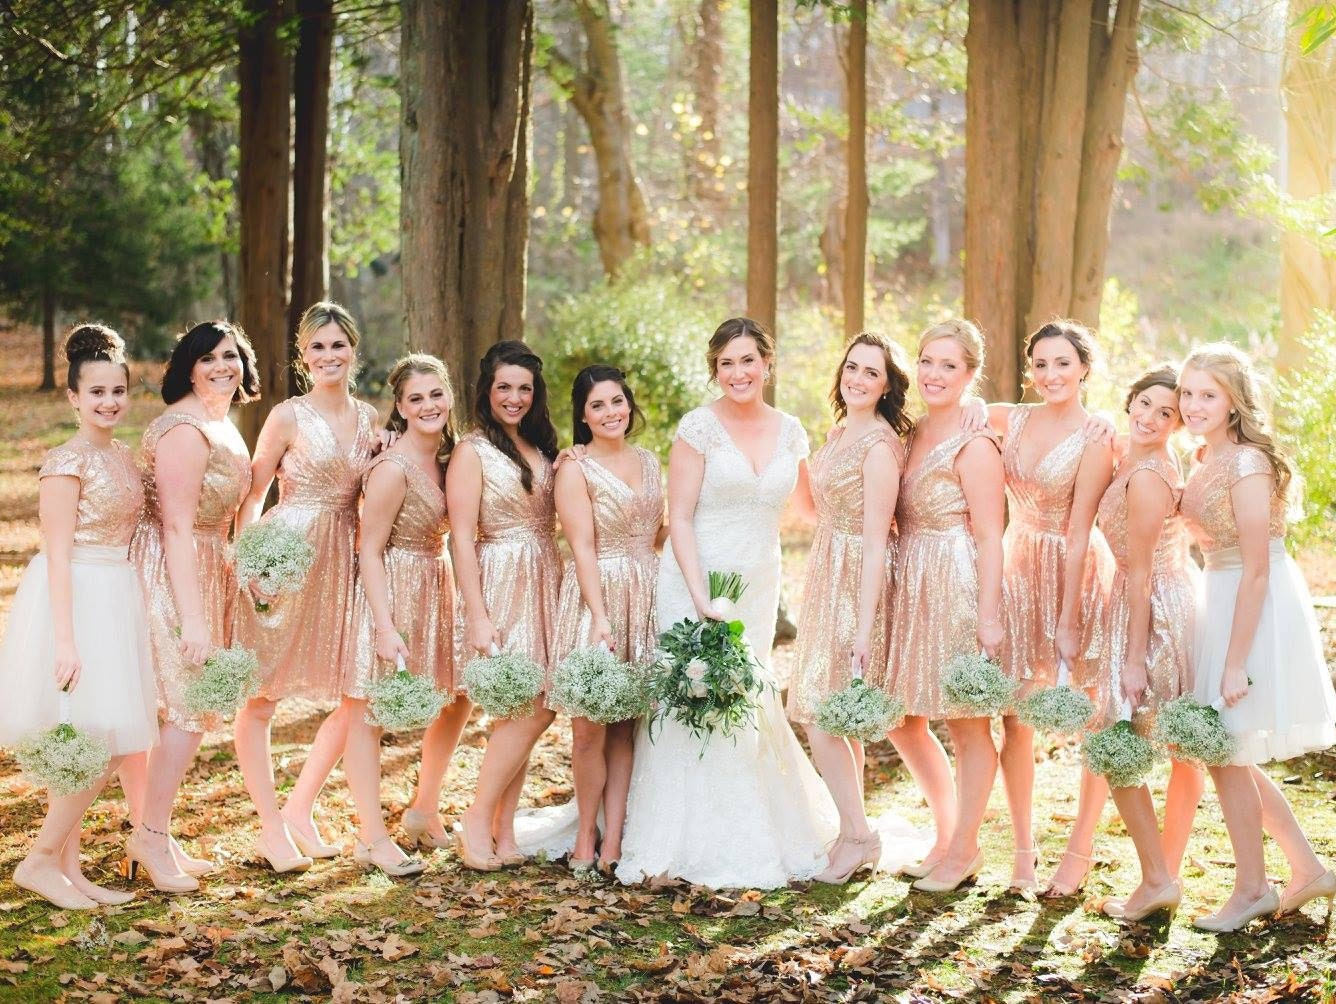 76dbb78ebbd Short Sequin Bridesmaids Dress   Rose Gold Sequin Bridesmaids